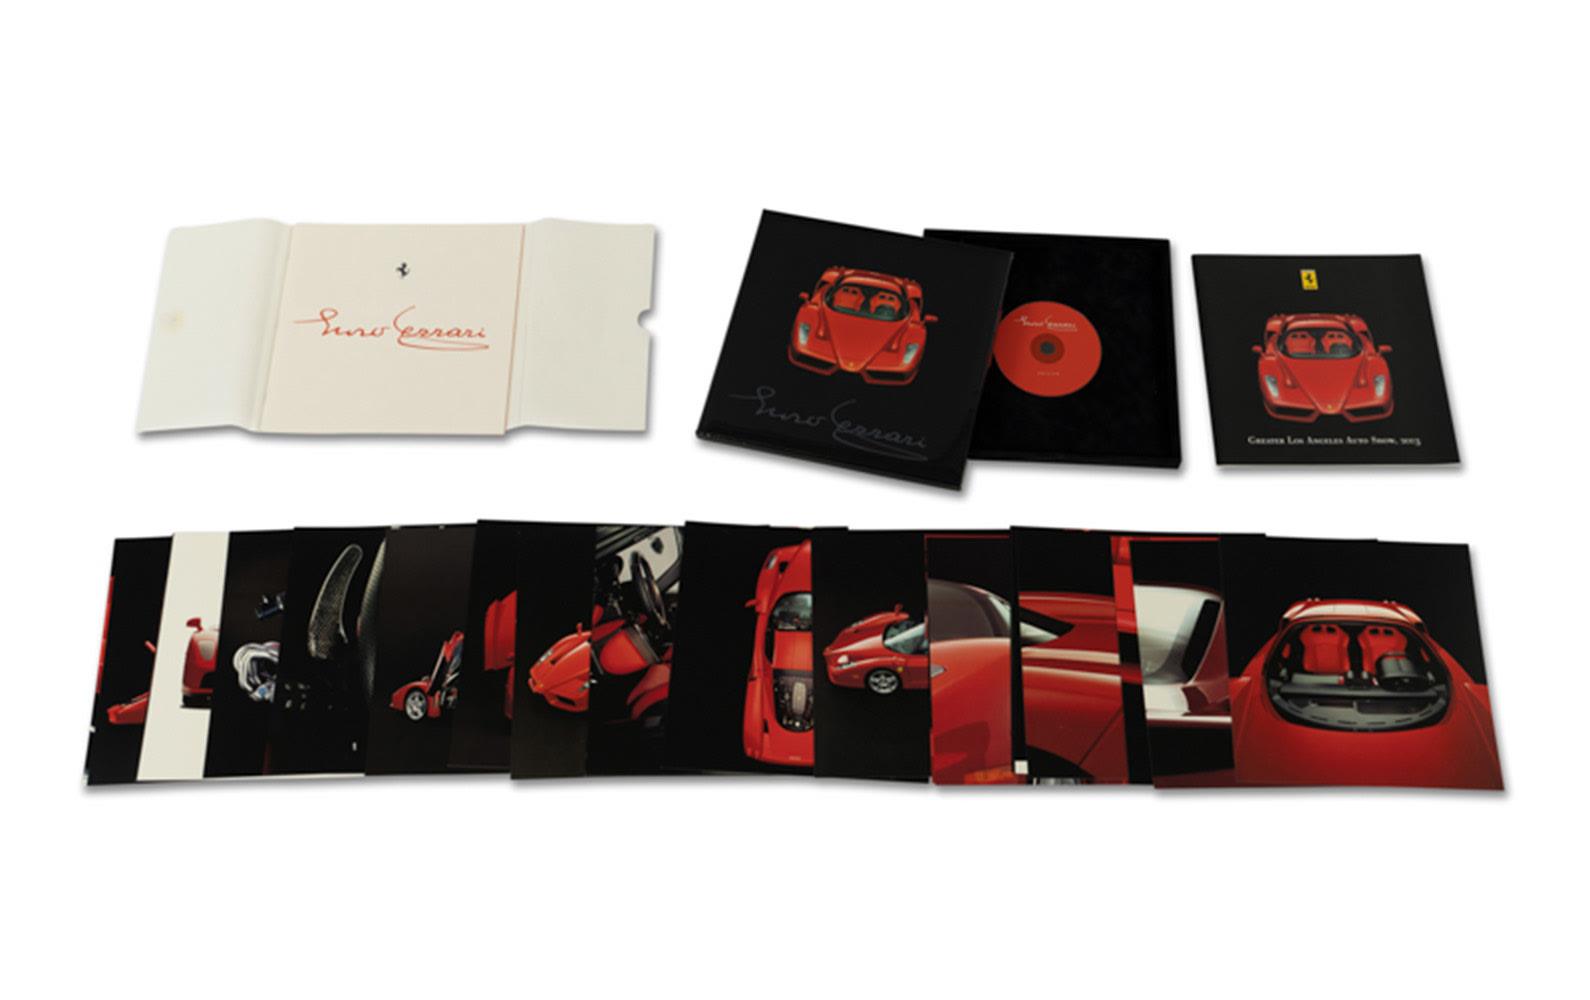 Ferrari Enzo 2003 Los Angeles Auto Show Press Kit